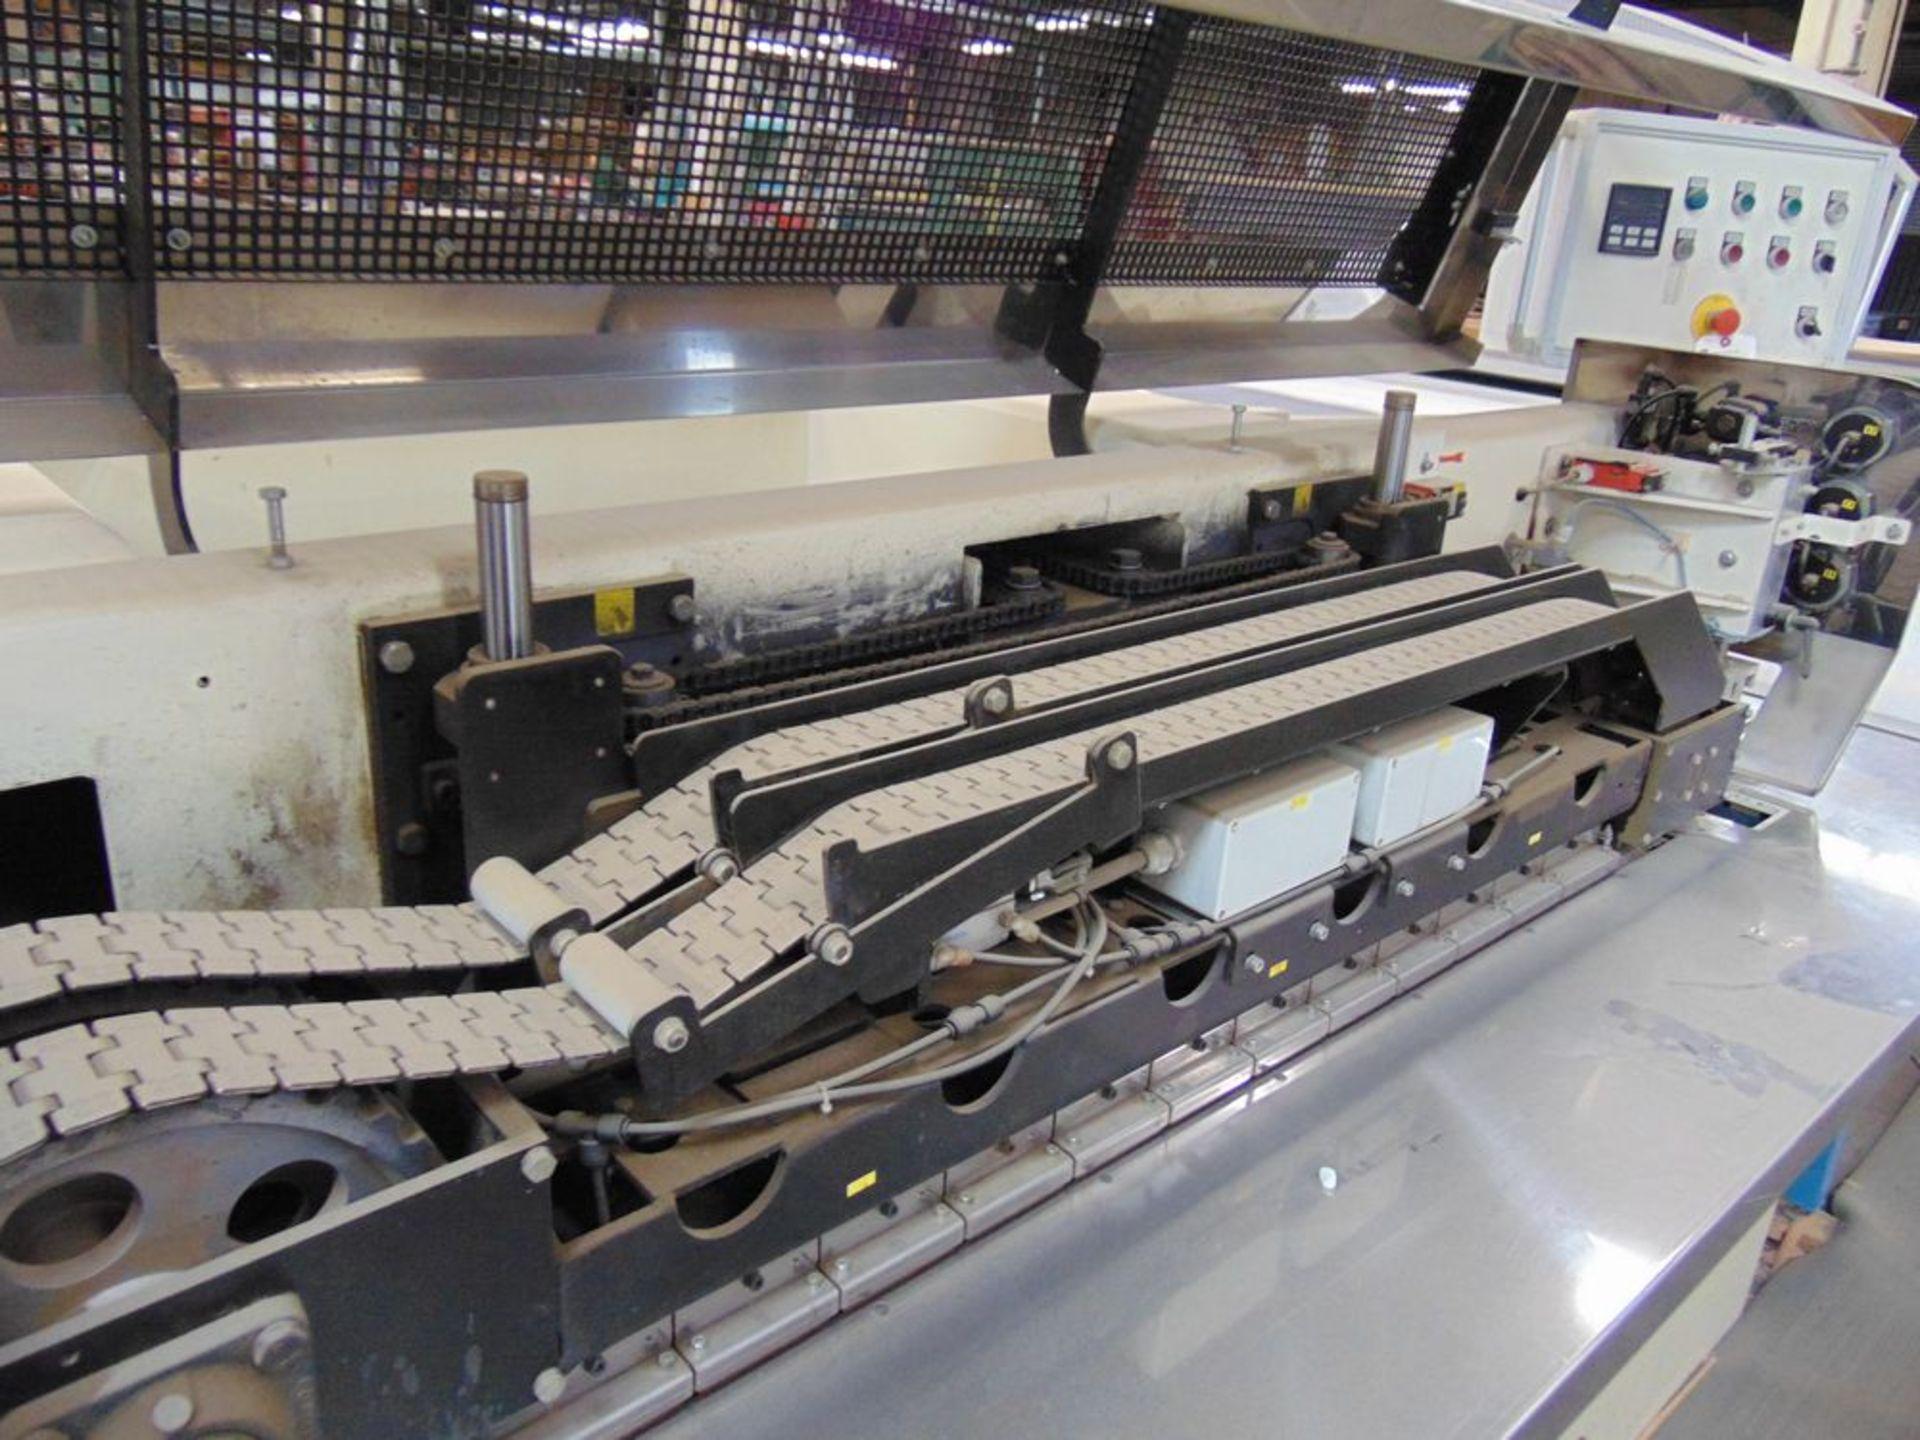 (1999) Kuper Type FCI Mach. No. 3908/0113 Veneer Splicing Machine w/ 54'' x 102''L Light Table; S/ - Image 6 of 7